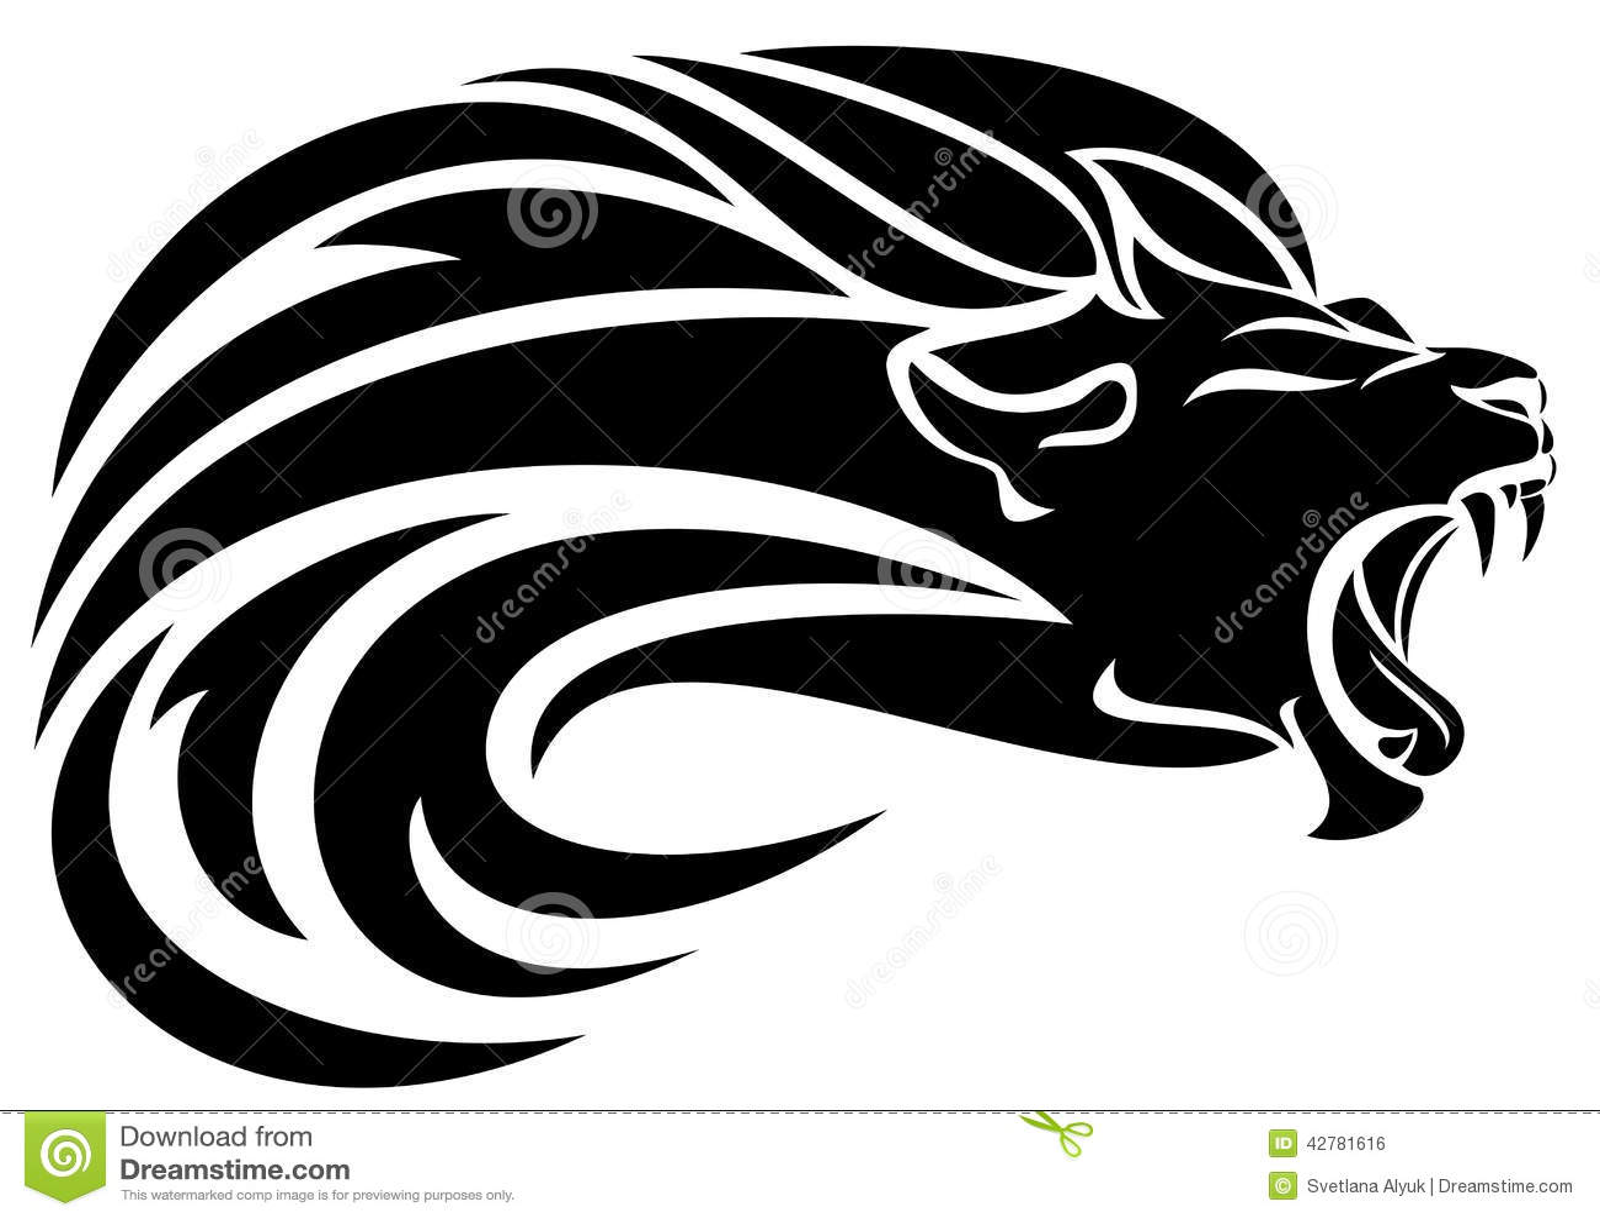 Lion head tribal design - black and white vector mane swirls.